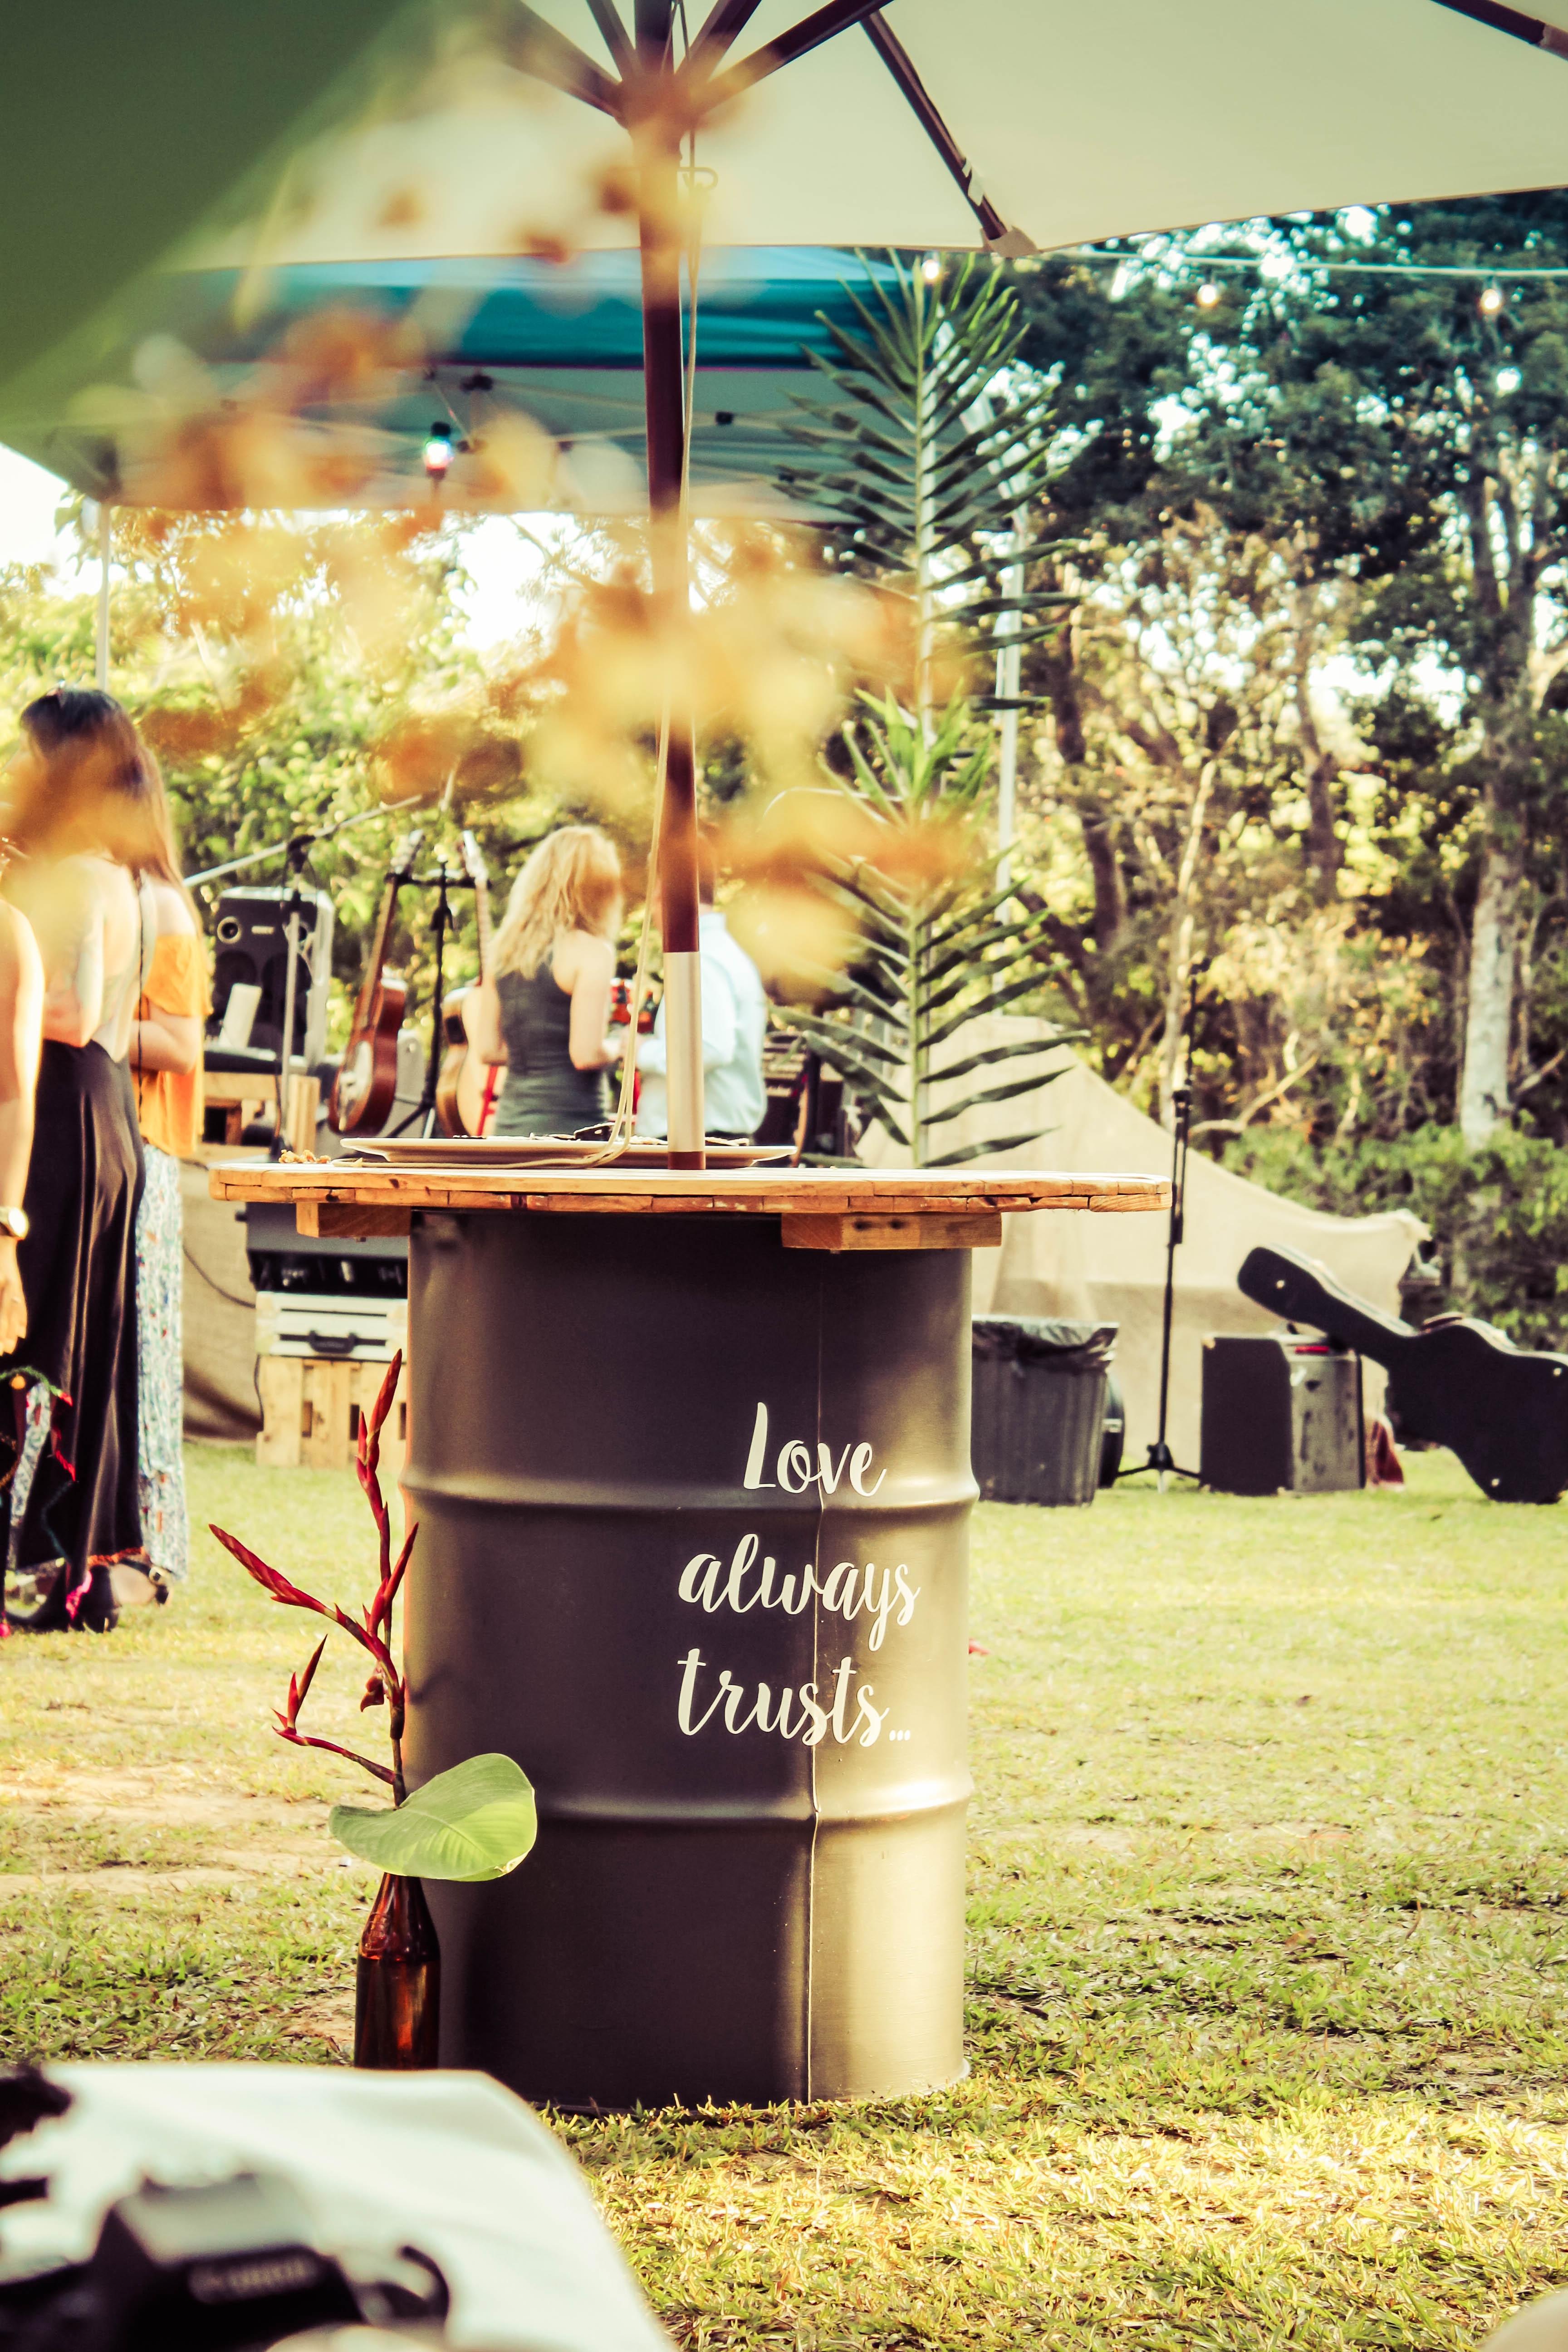 Matrimonio Rustico Como : Decoracin rstica para bodas deco boda rustica casamiento